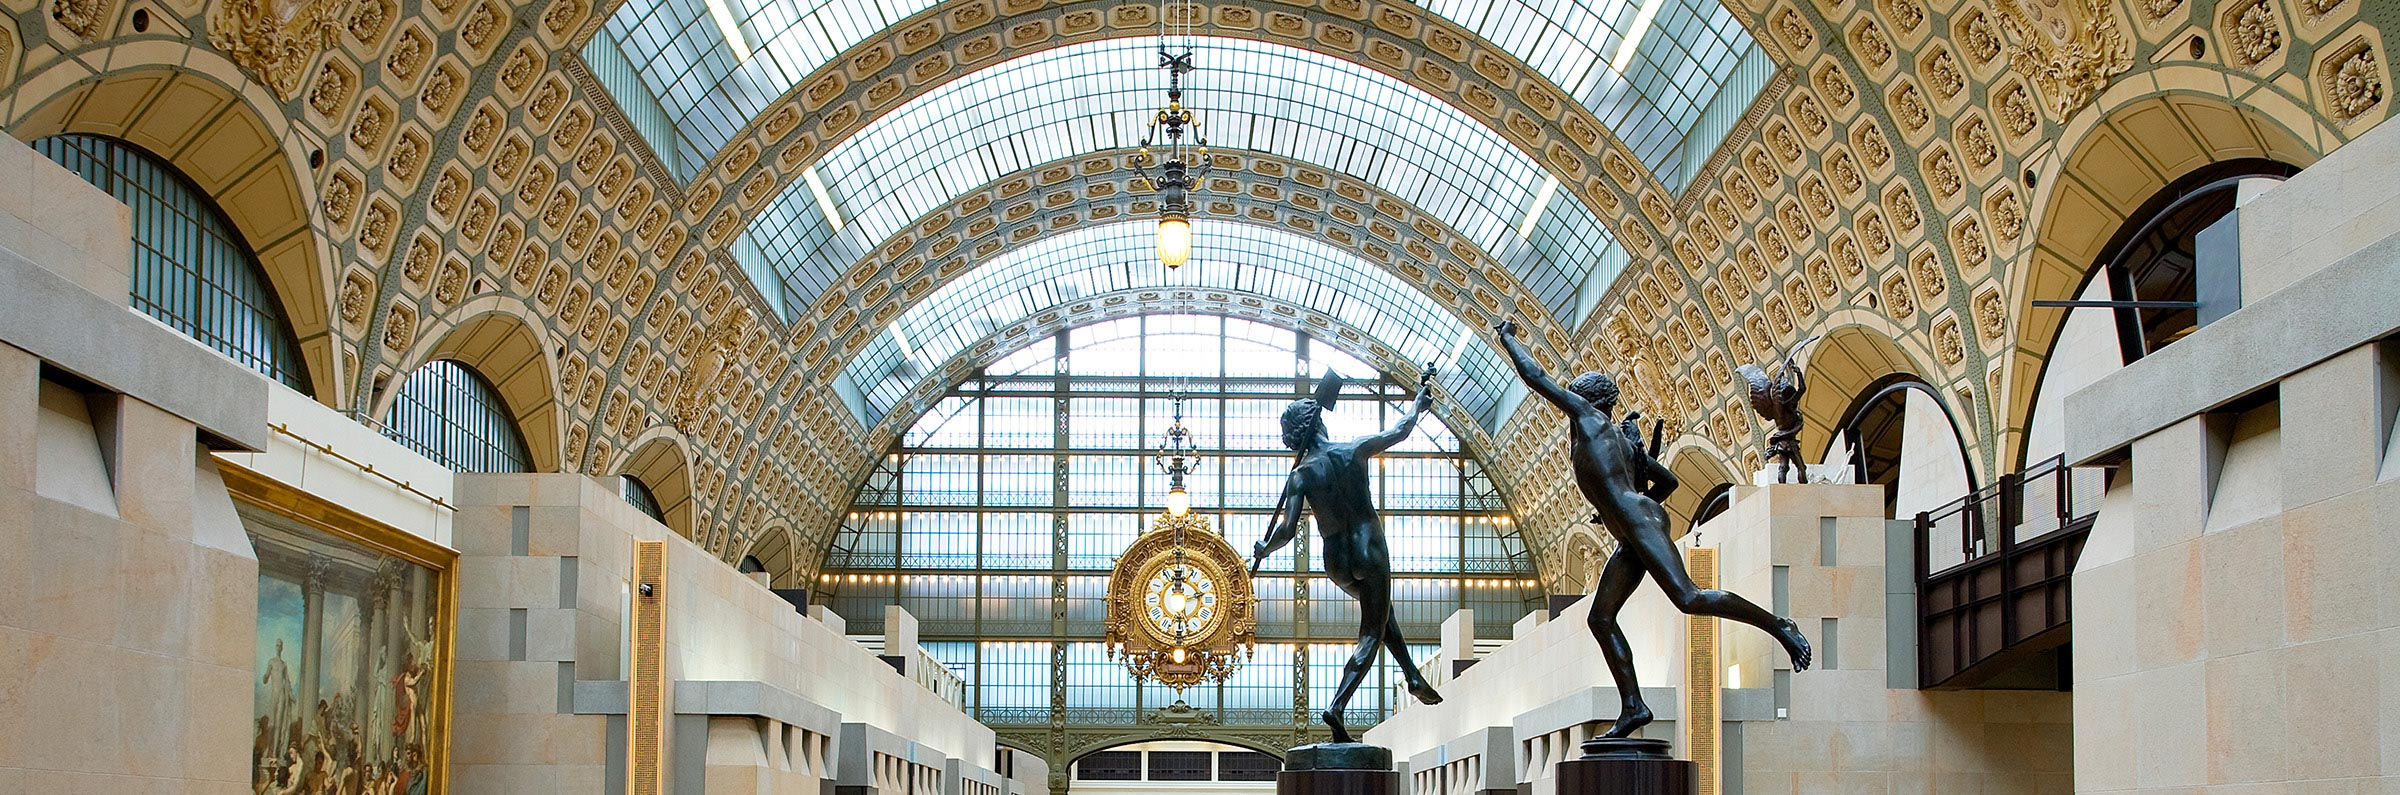 Art and culture in Paris